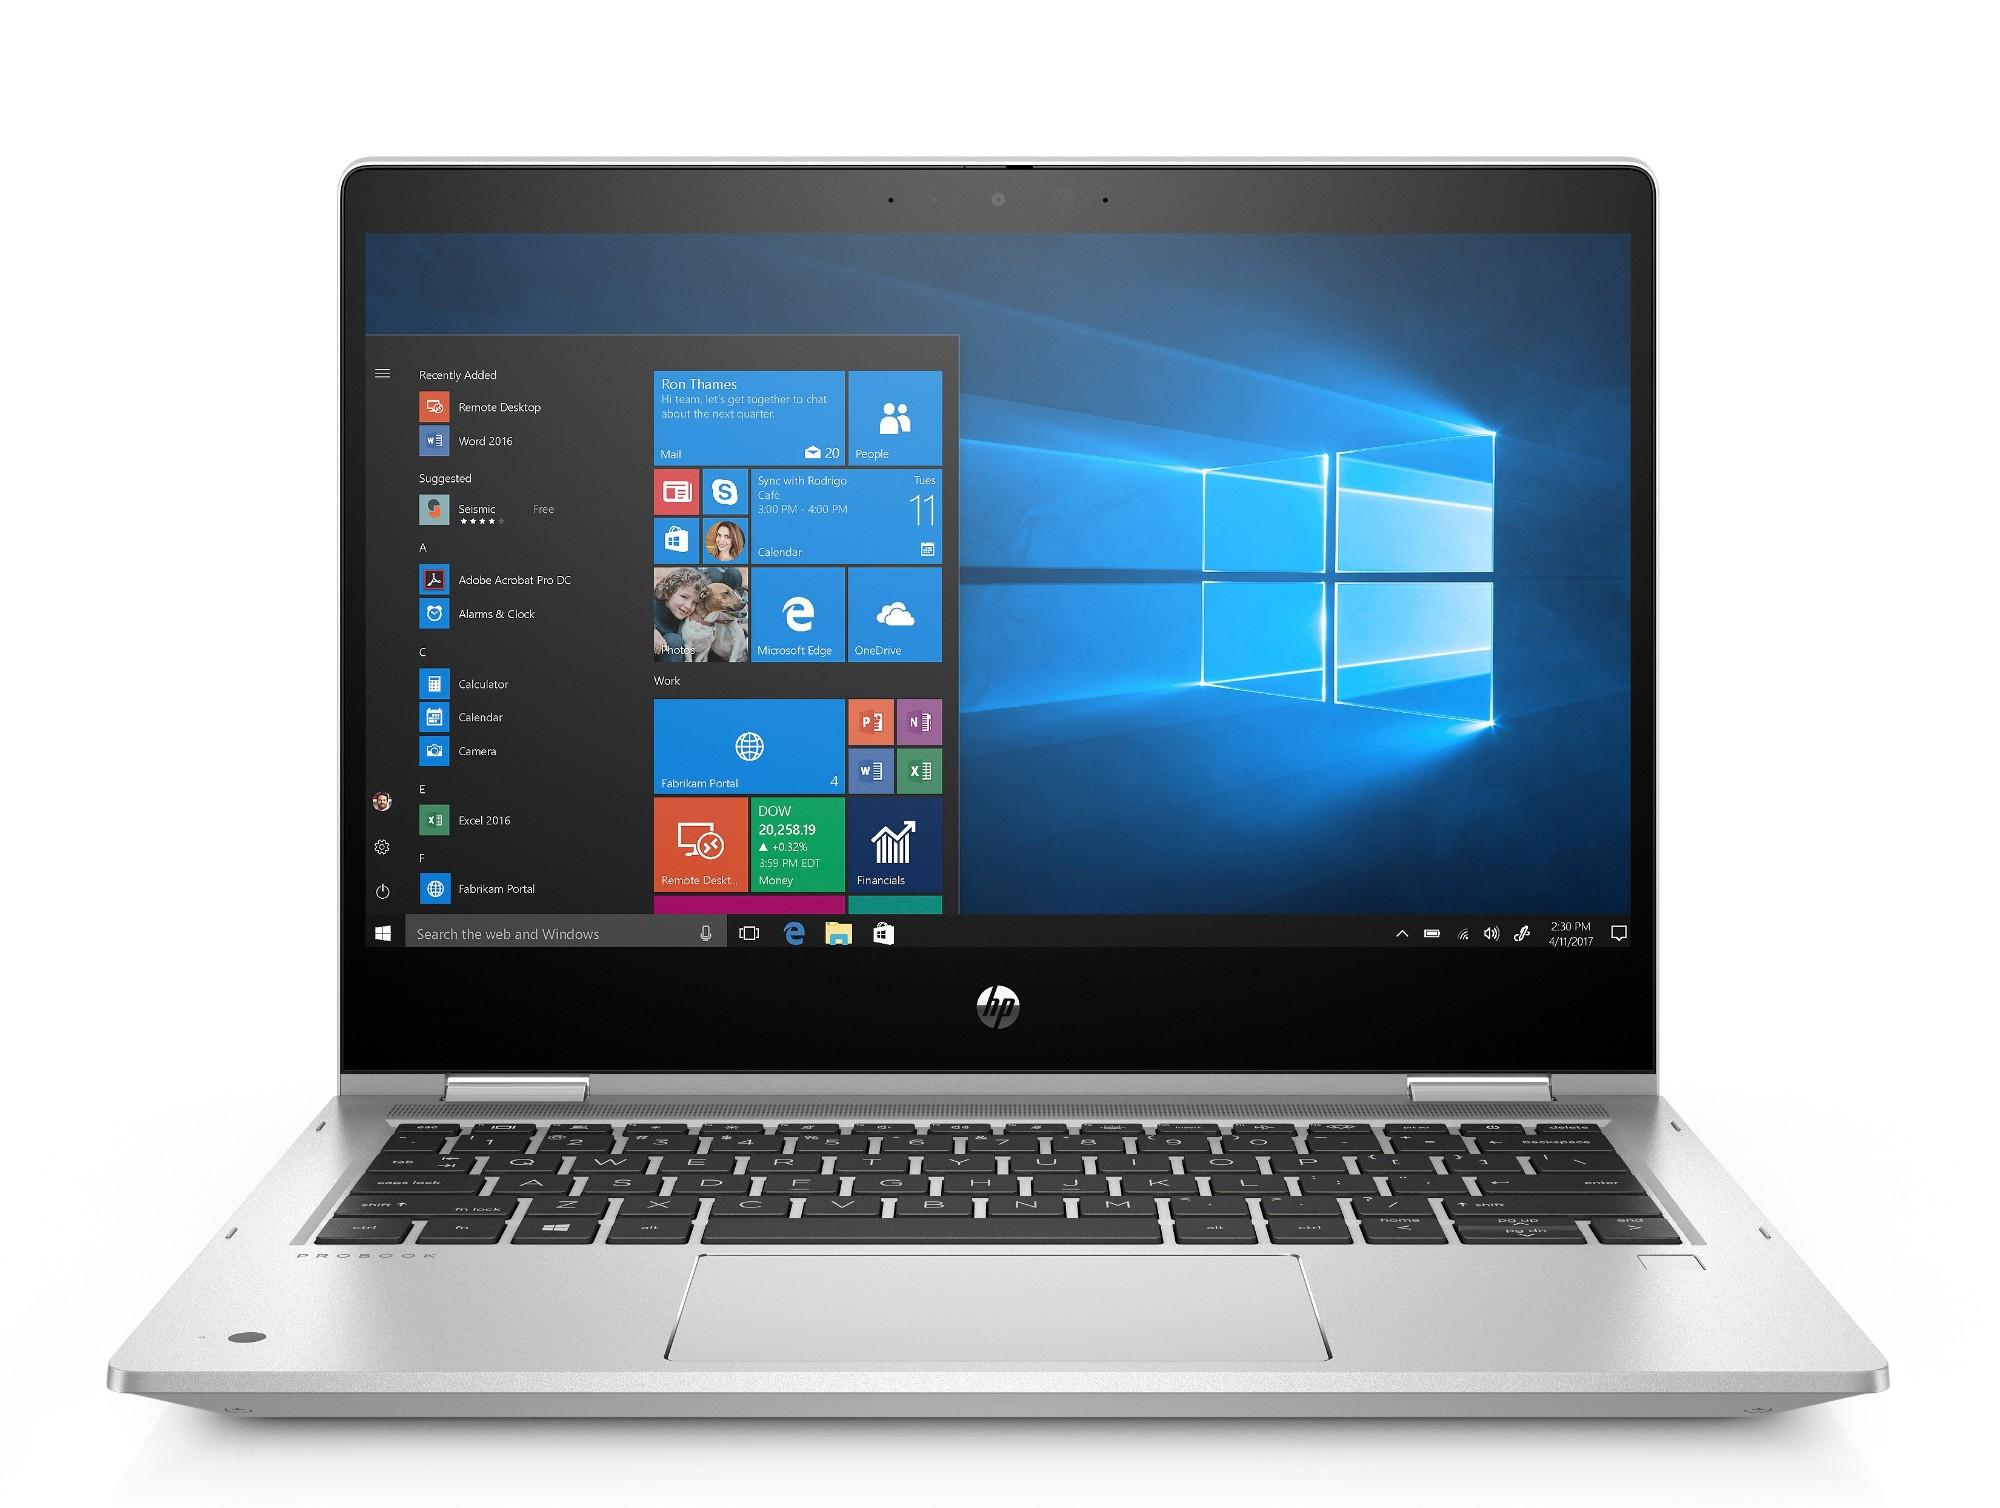 HP ProBook x360 435 G7 Notebook PC (8RA64AV) Hybrid (2-in-1) Silver 33.8 cm (13.3